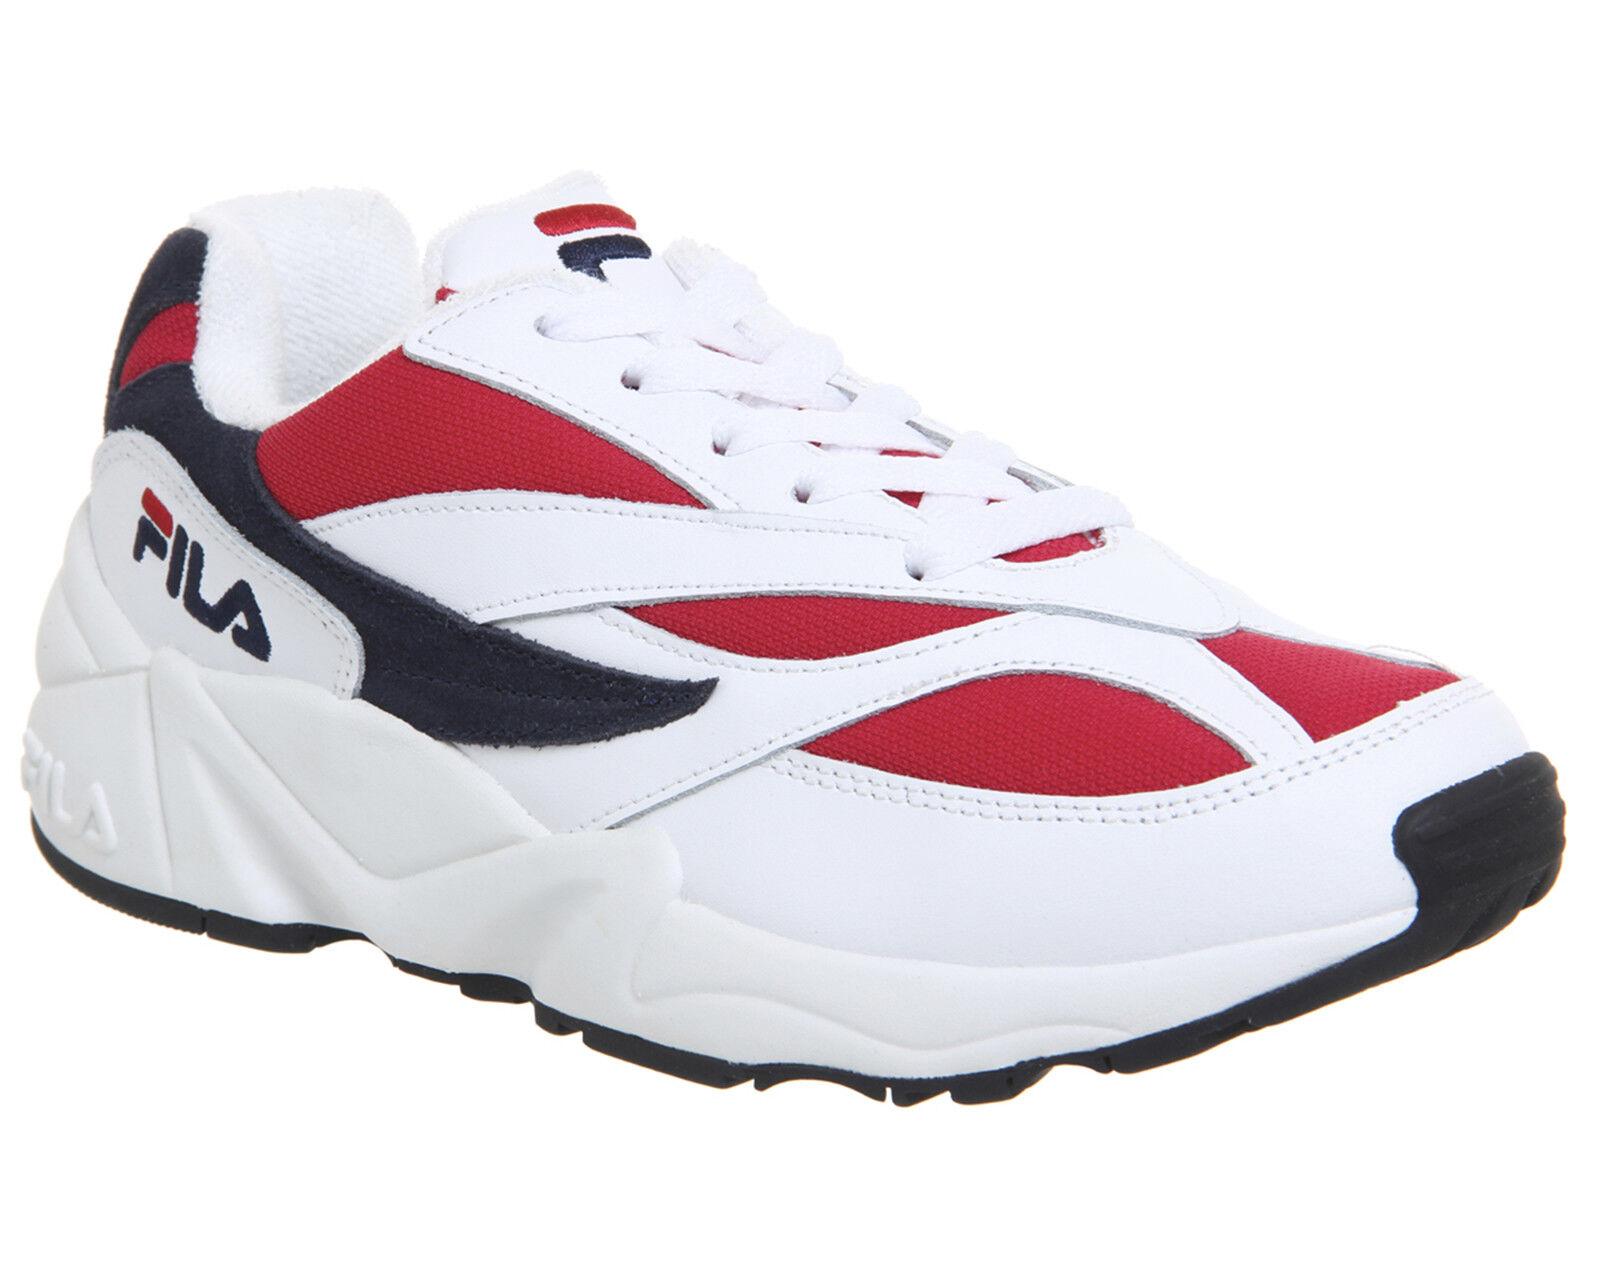 b1c5b4f7eea Womens Fila Venom Trainers White Fila Fila Red Trainers shoes Navy ...